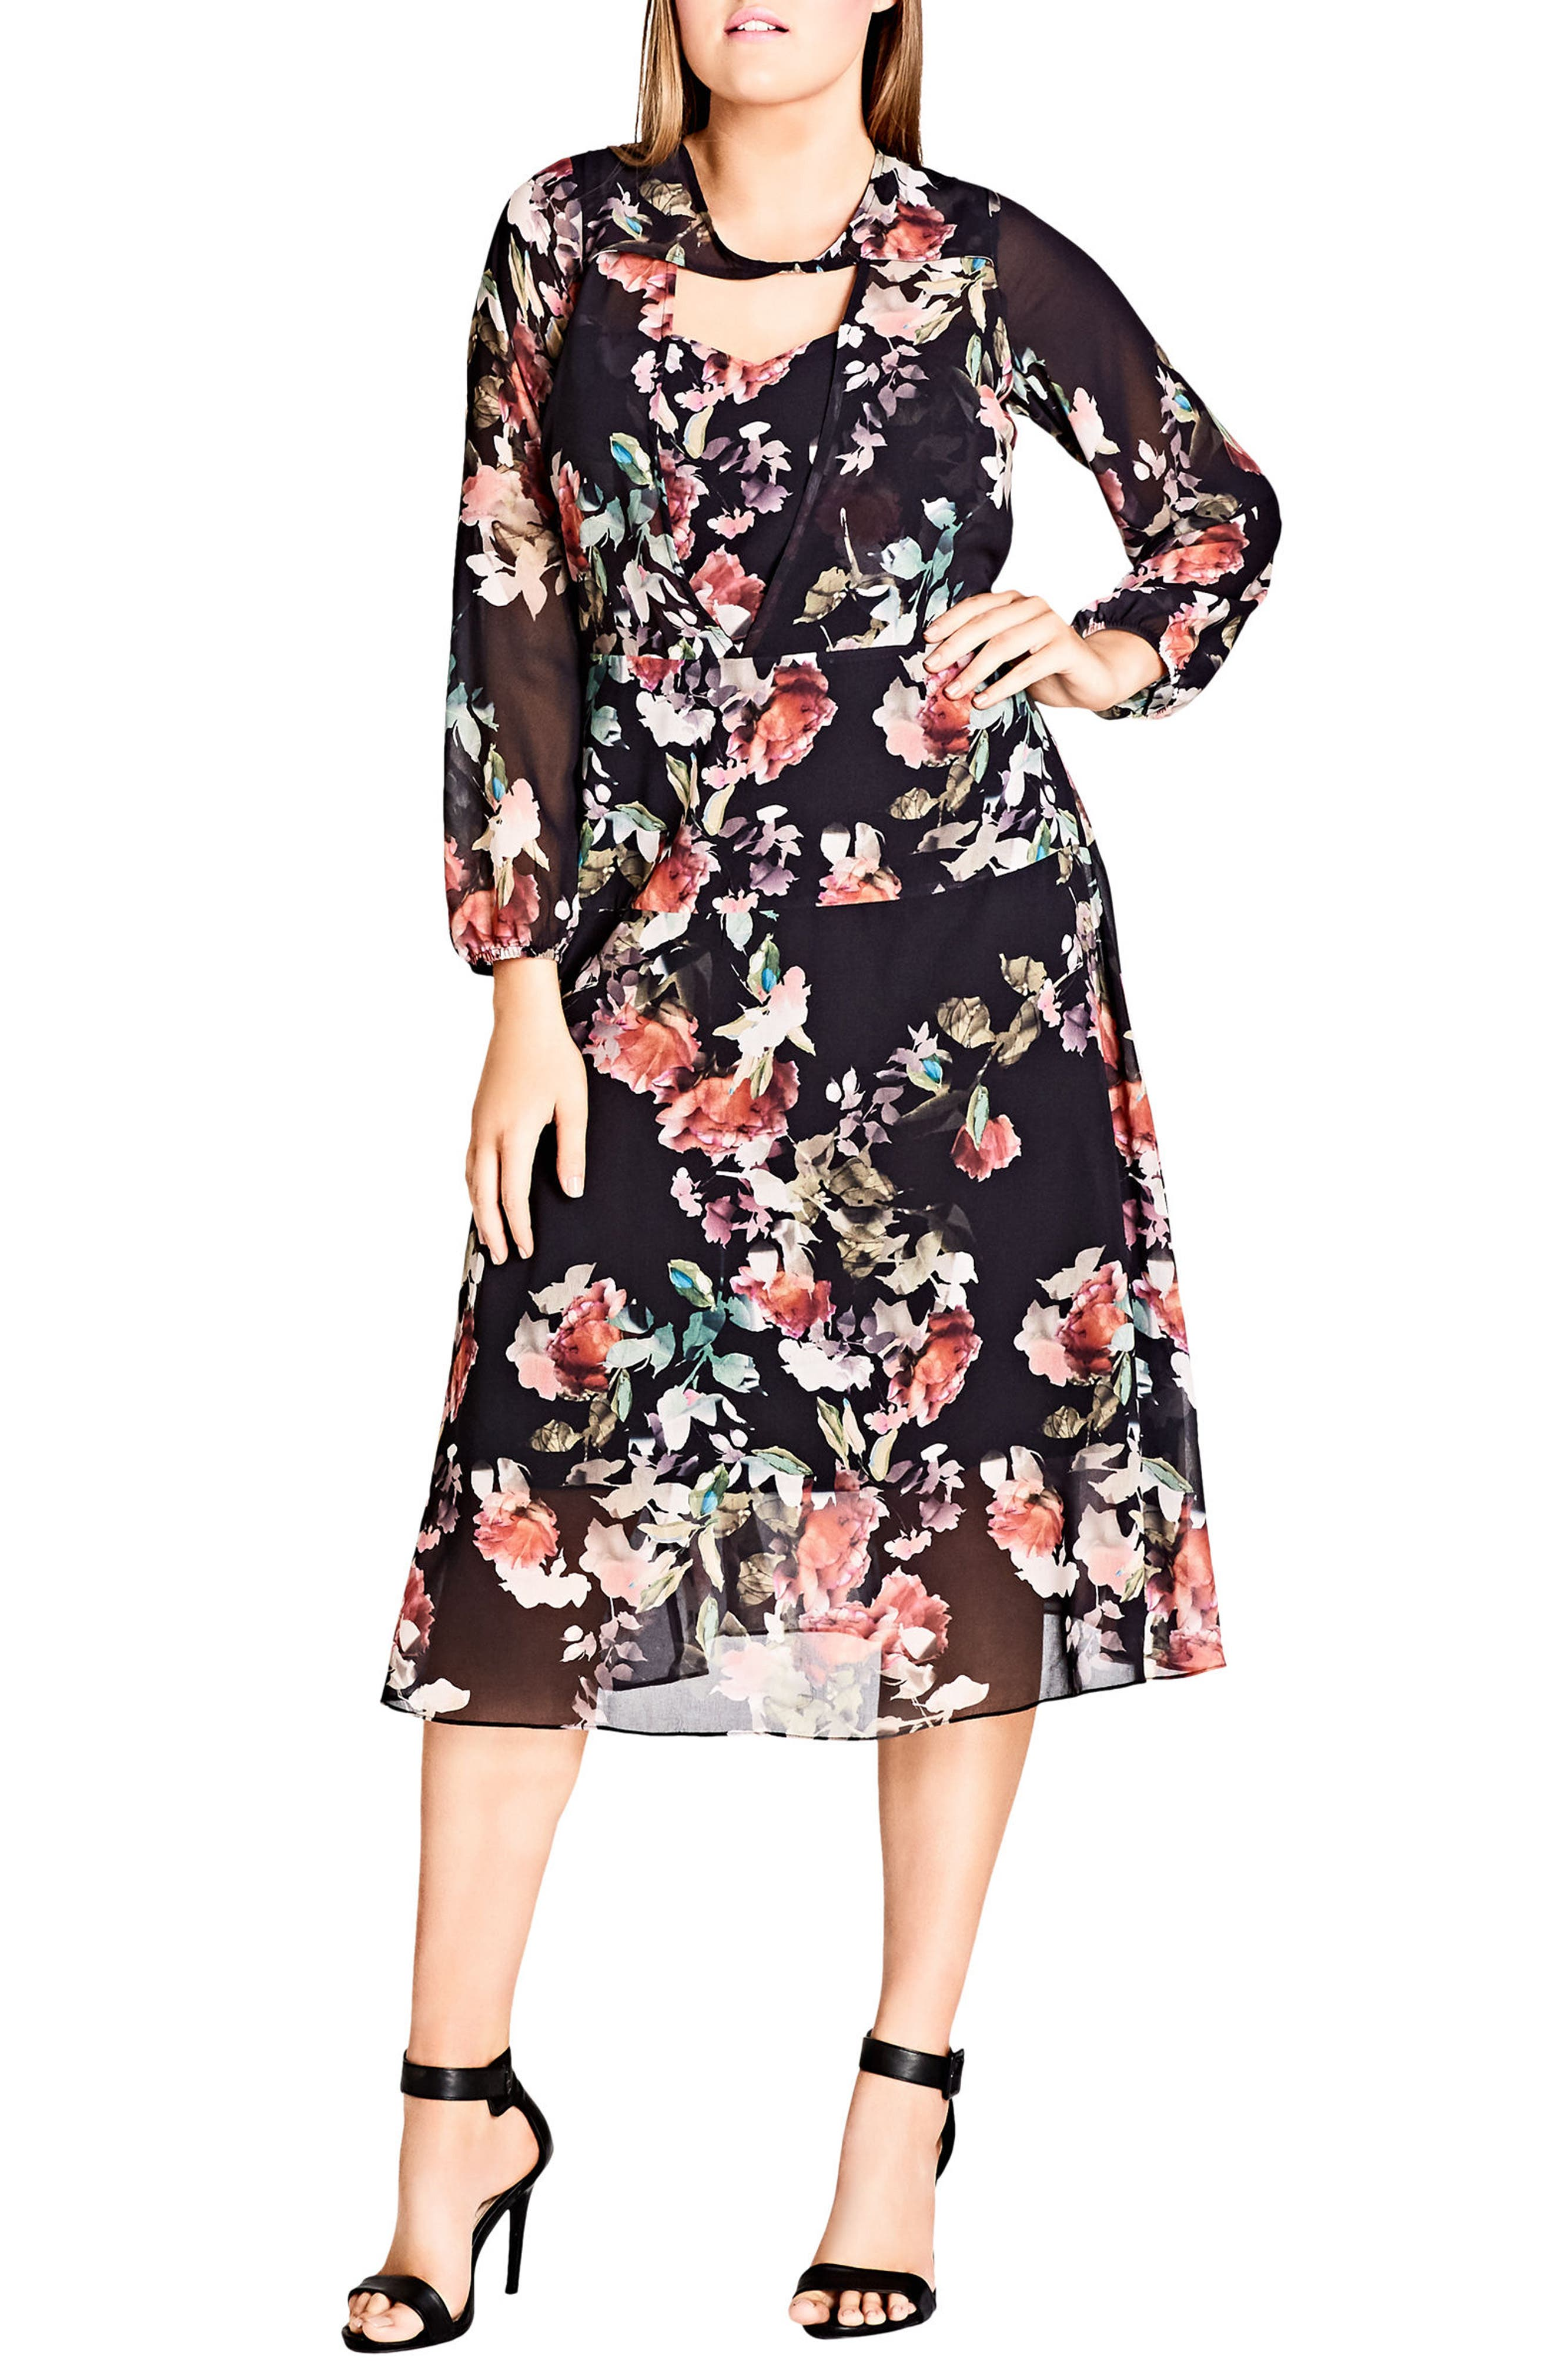 CITY CHIC Sheer Divine Floral Print Midi Dress, Main, color, 001